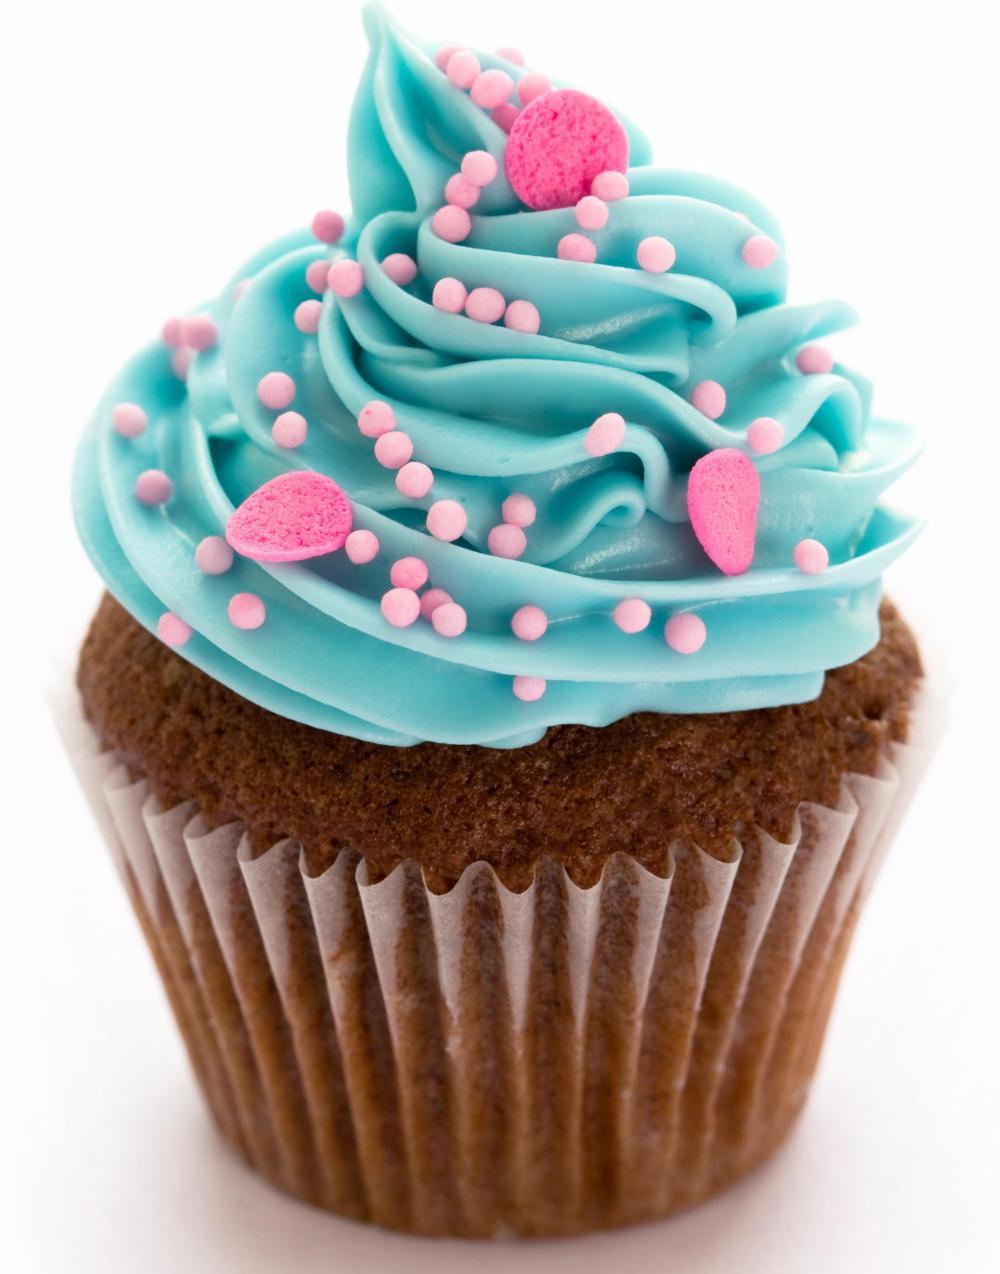 Fabulous Cupcakes 1000 x 1274 · 101 kB · jpeg